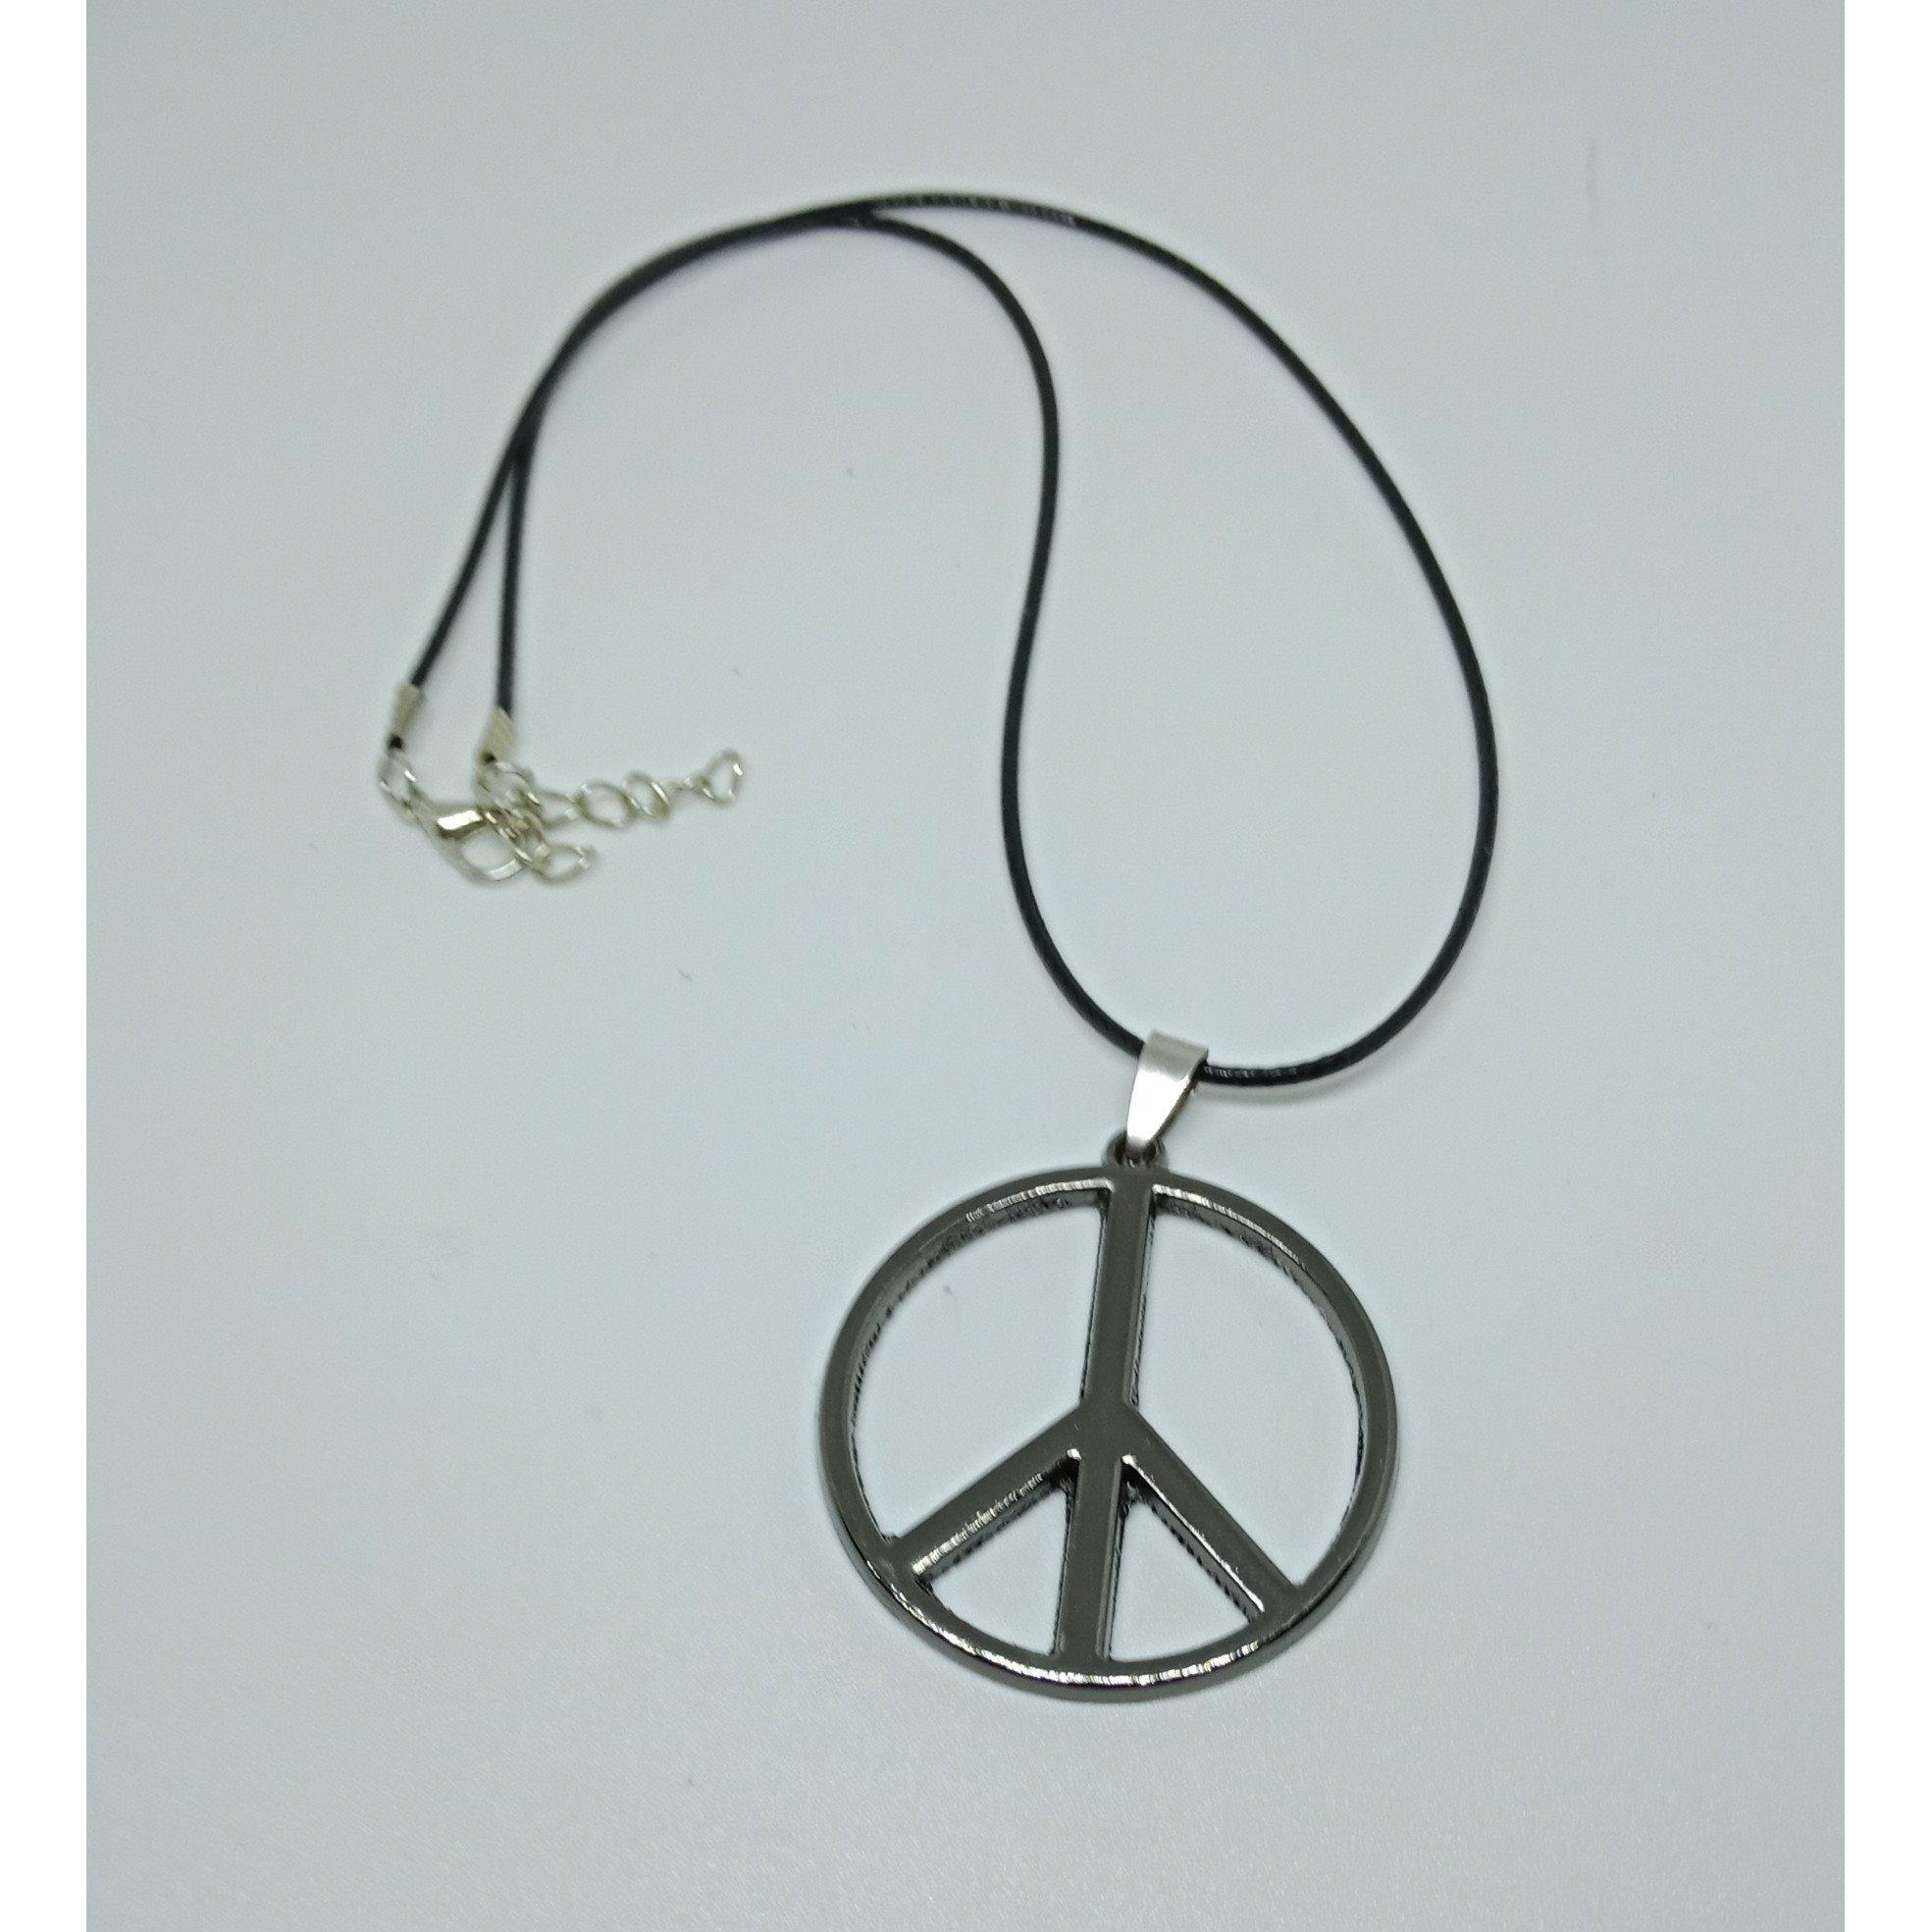 ... Robagin kalung lambang perdamaian 4cm stainless pgs41 - 4